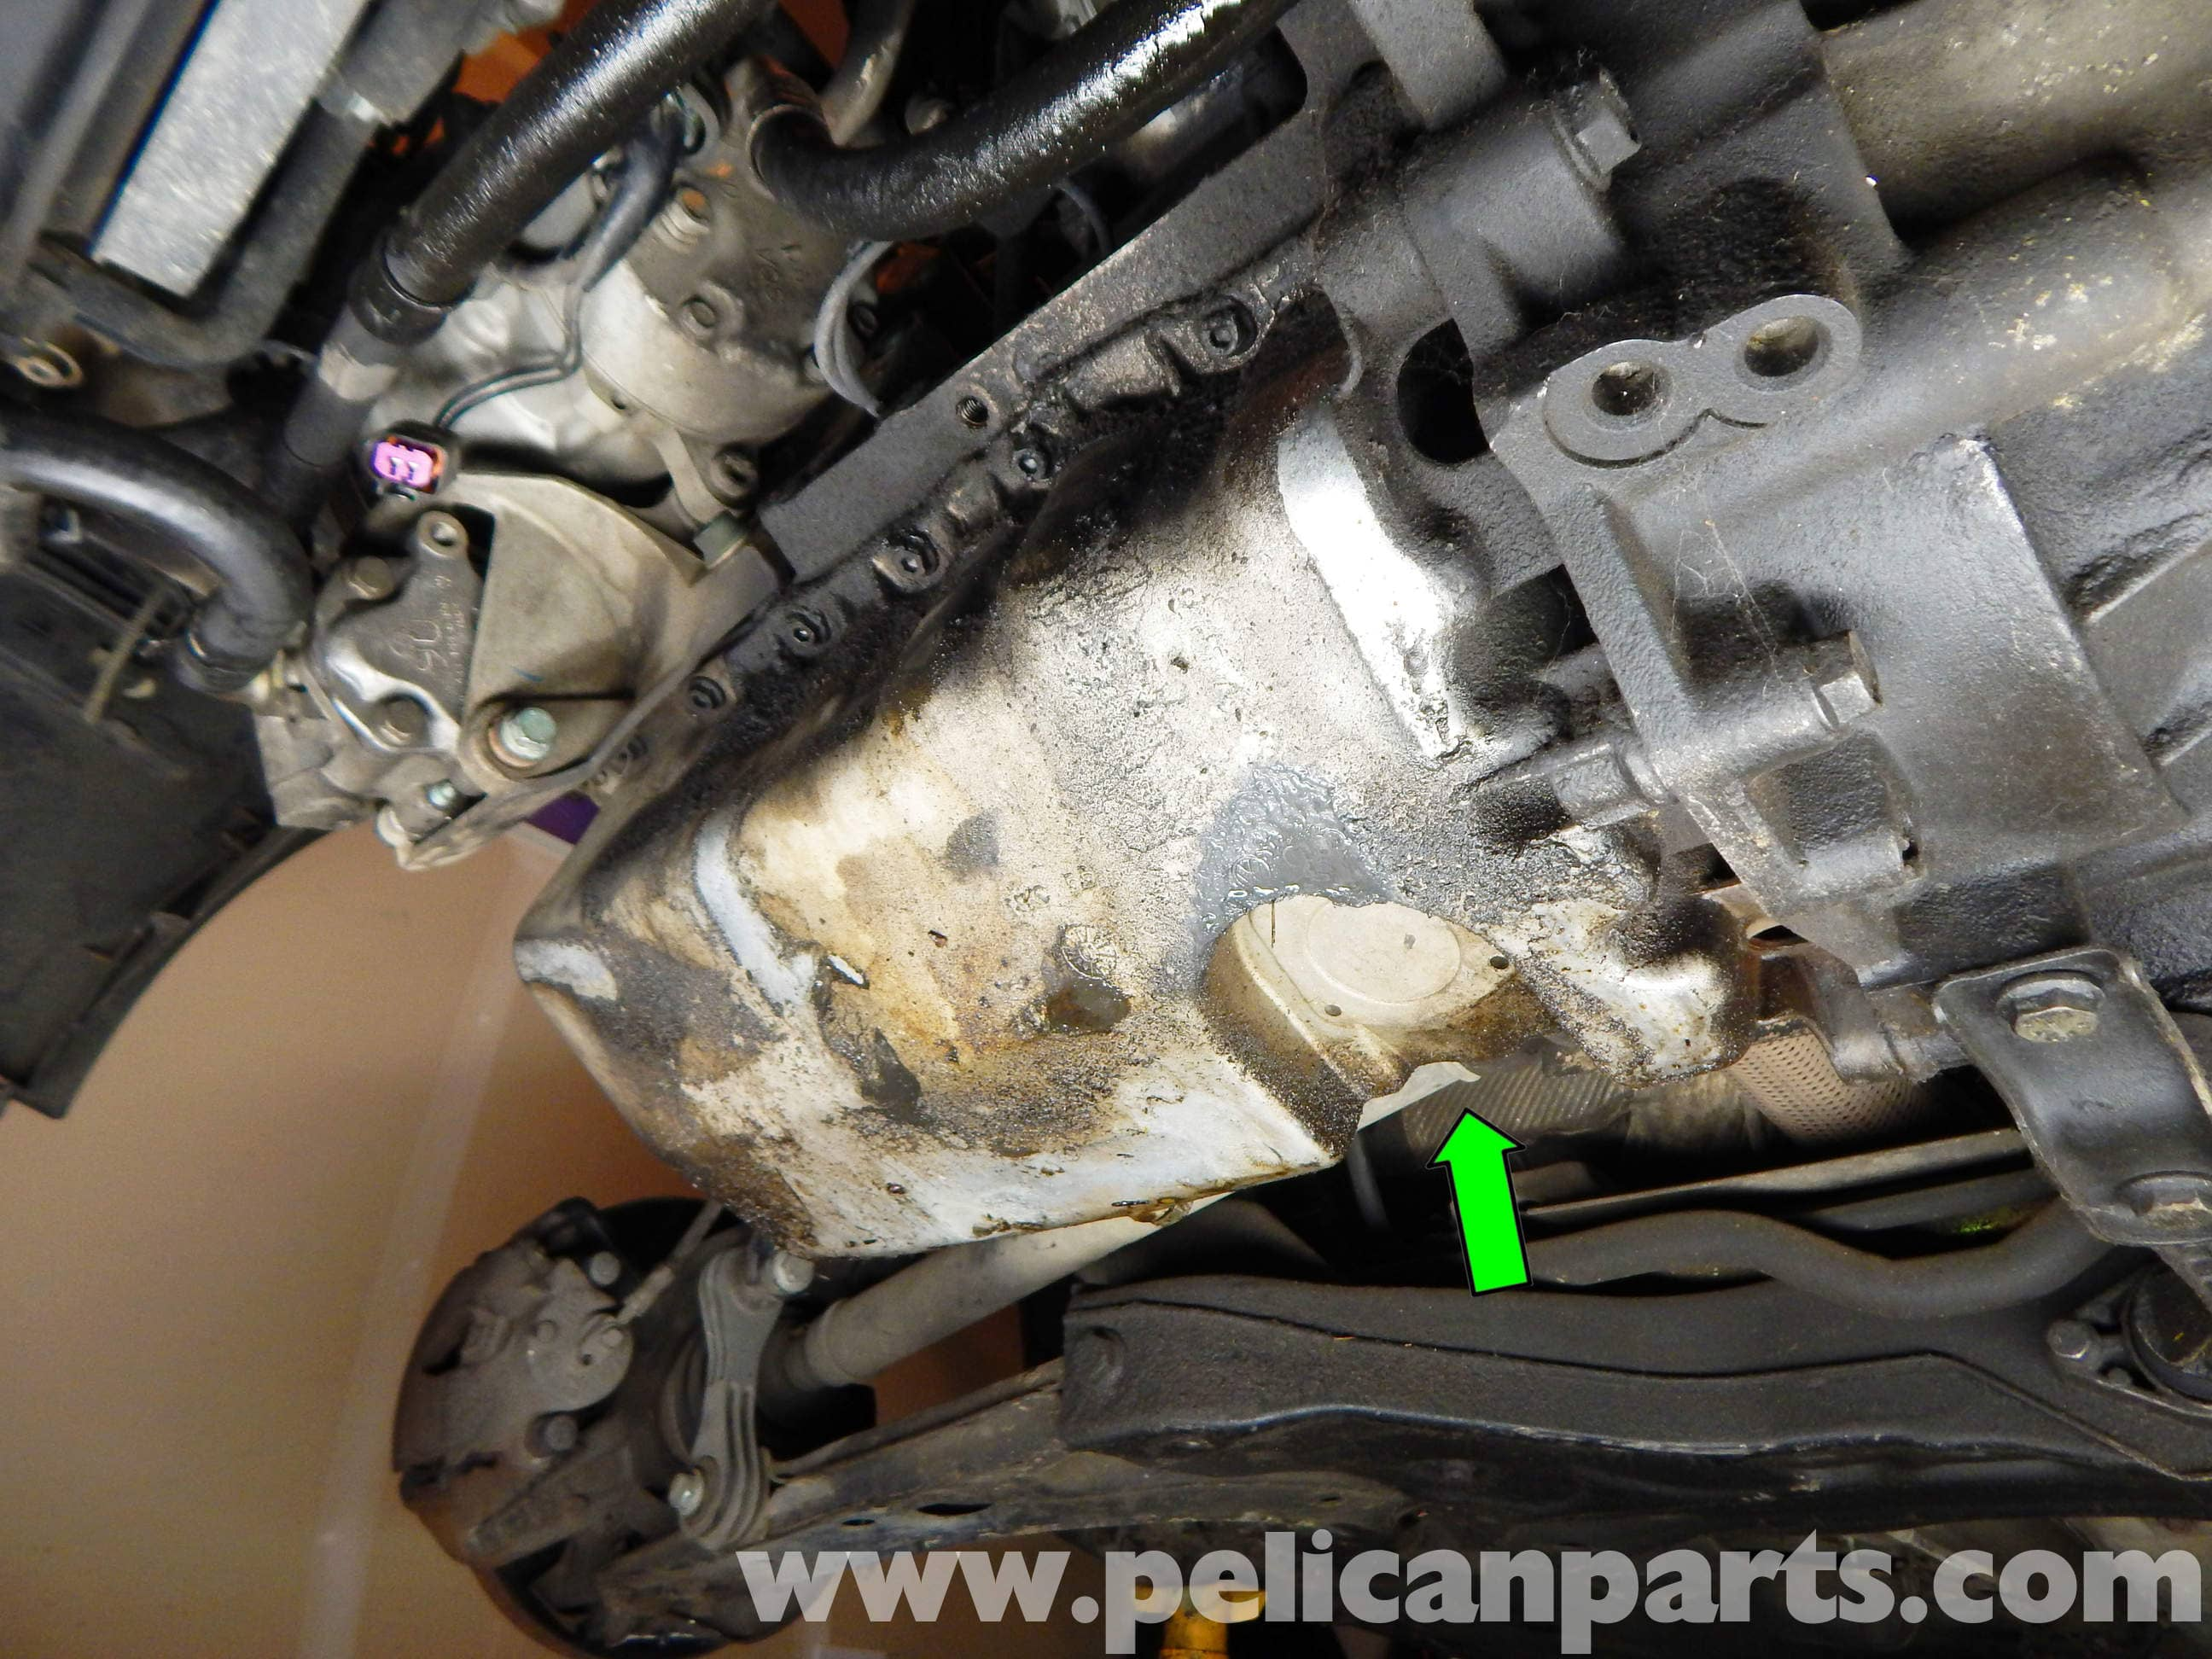 Replacement for VOLKSWAGEN JETTA 1999-2005 Engine Oil Pan Gasket